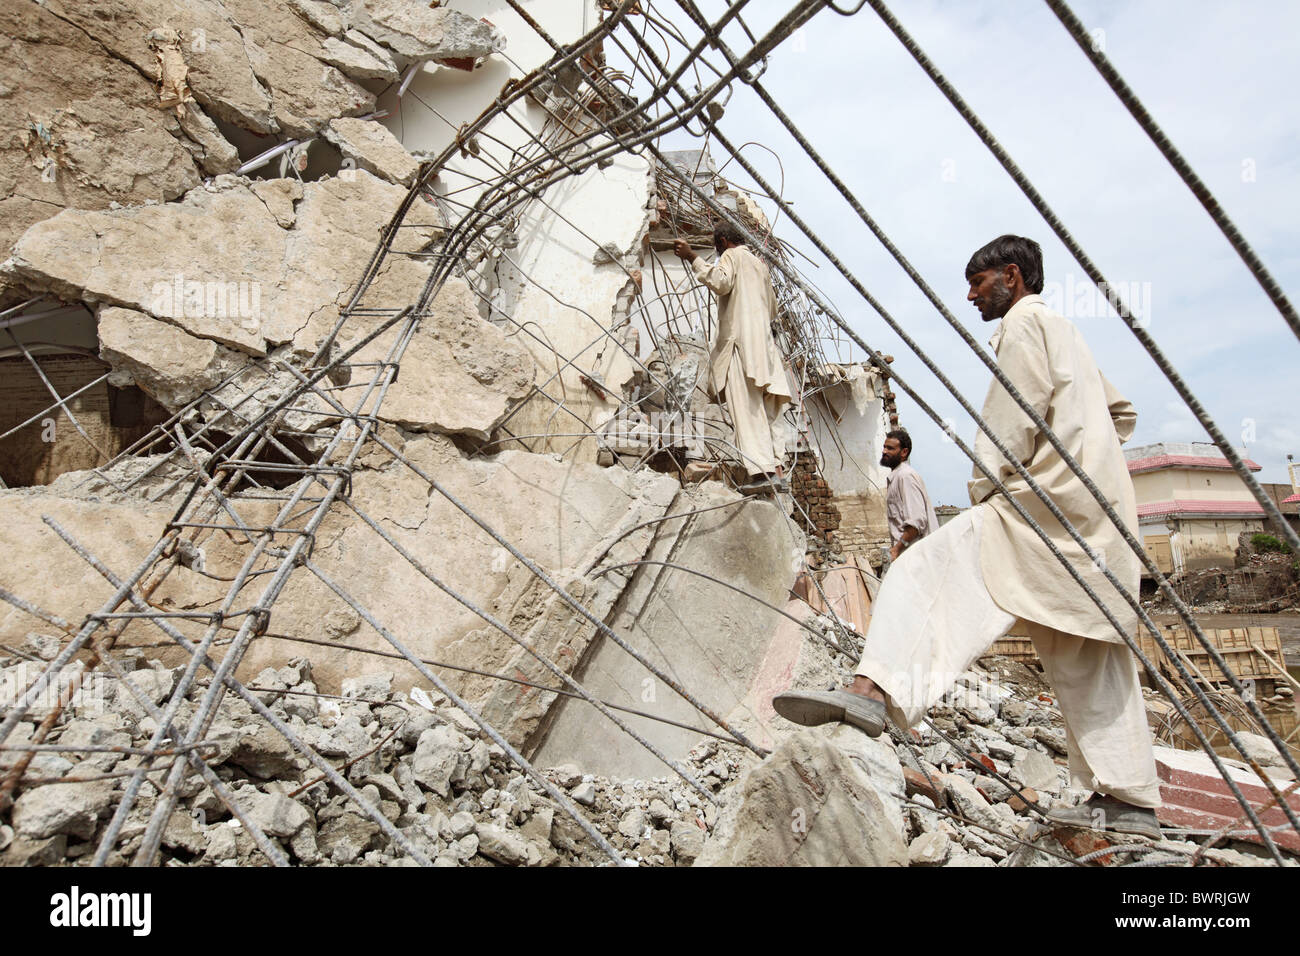 Destroyed house on the bank of Swat River, Mingora, Pakistan Stock Photo